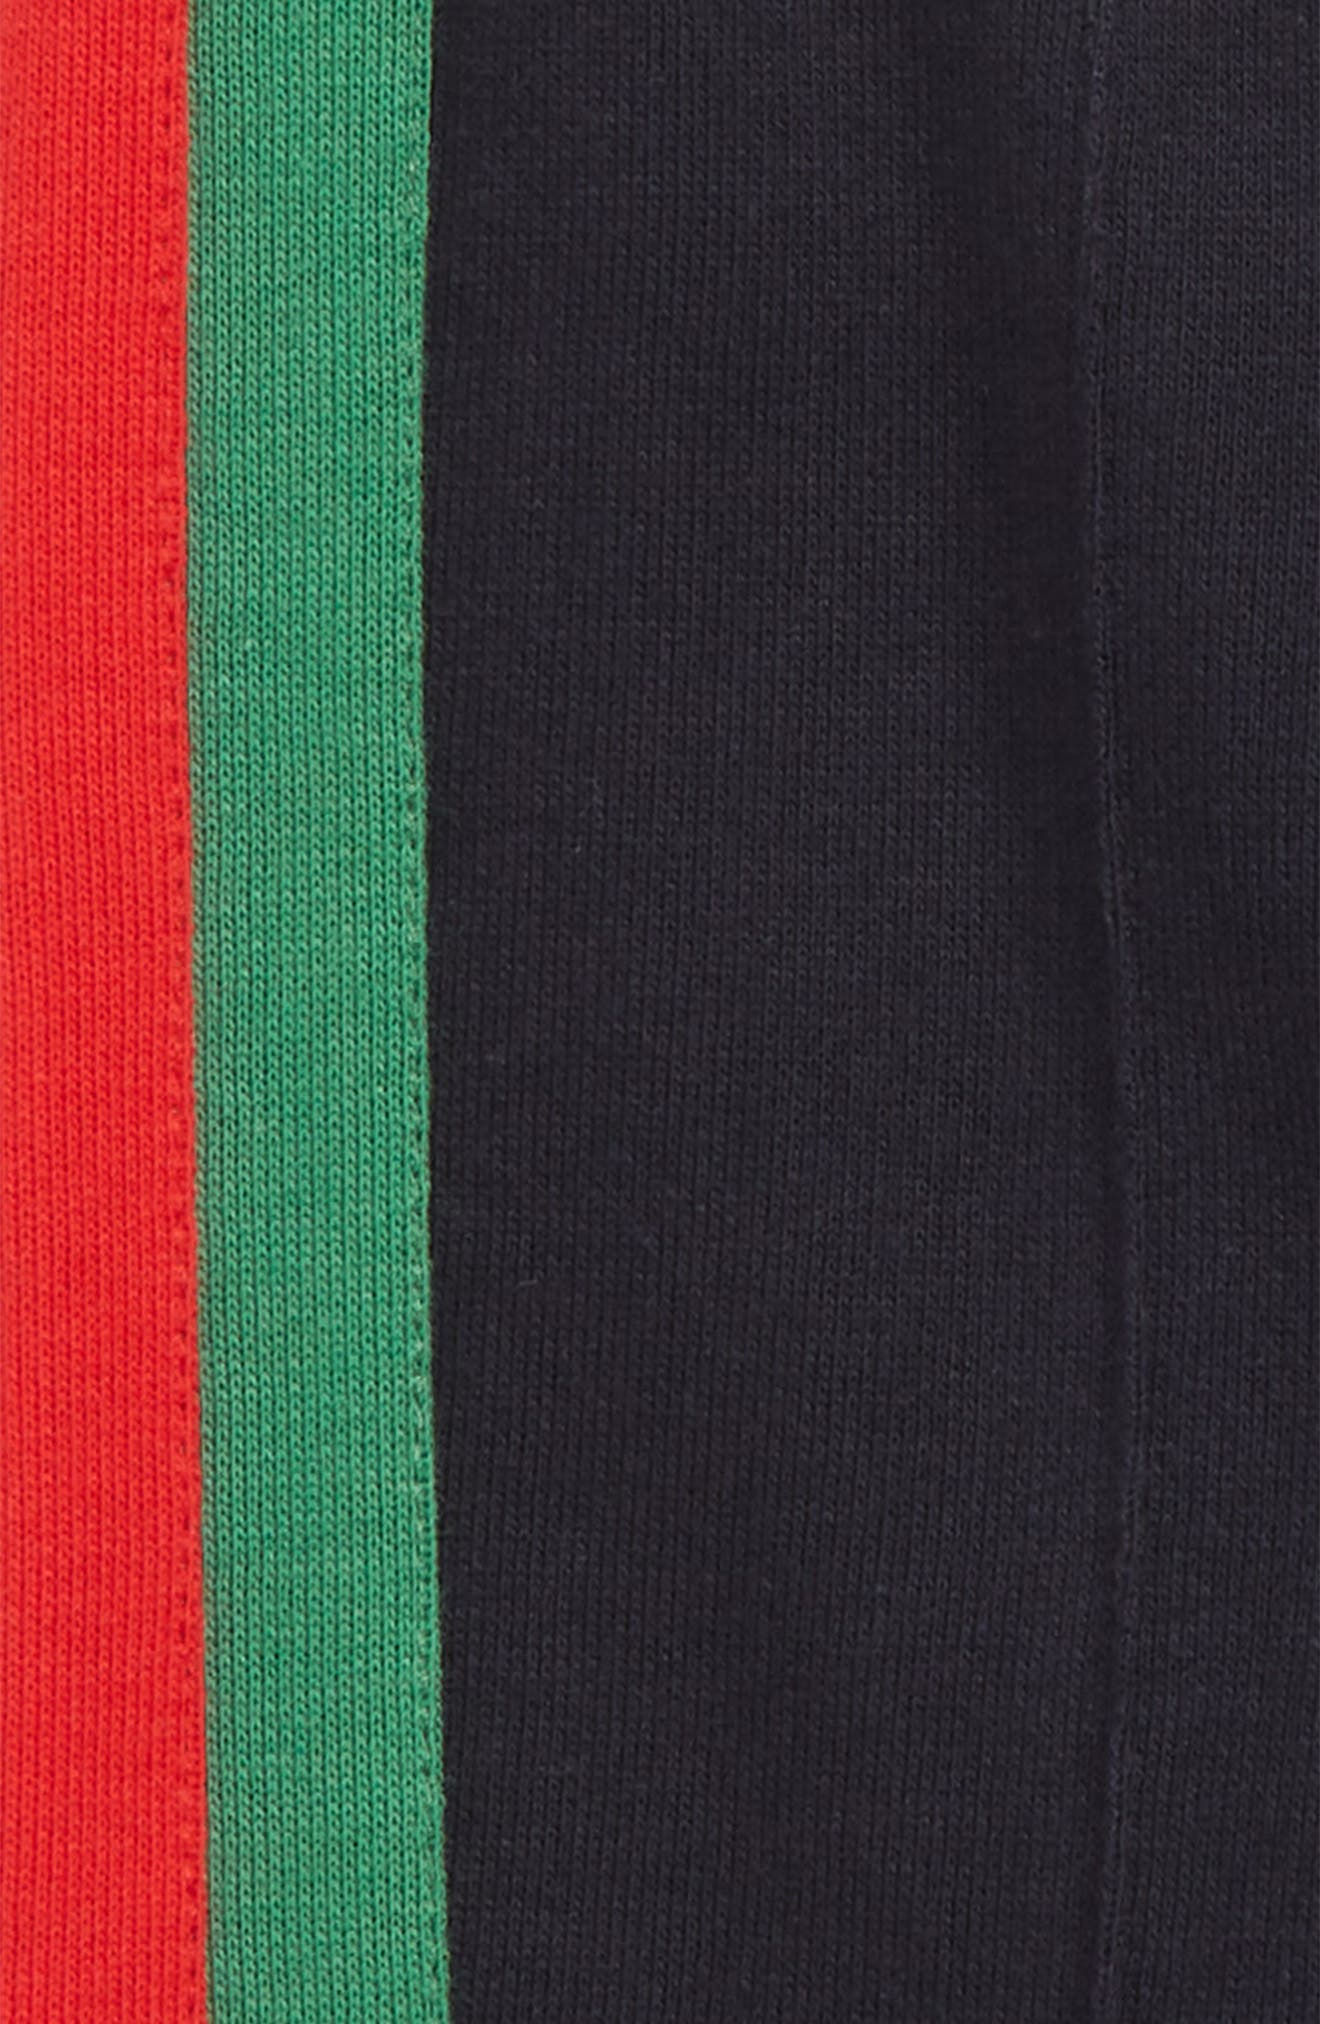 Stripe Jogger Pants,                             Alternate thumbnail 2, color,                             URBAN BLUE/ GREEN/ RED